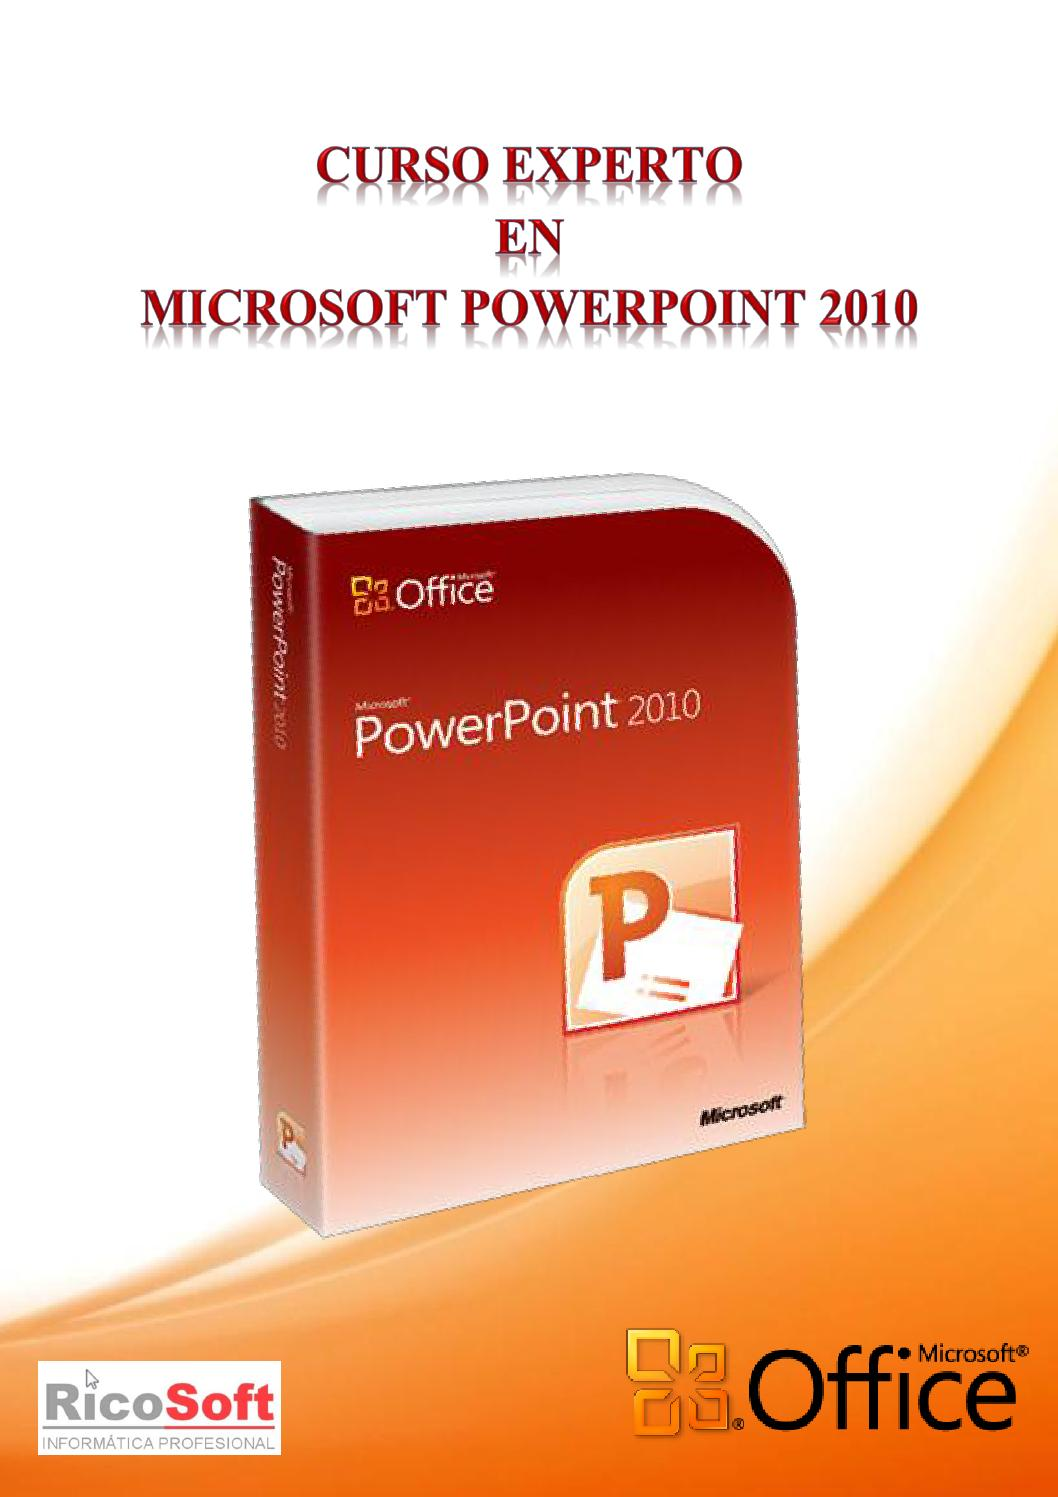 Curso experto en powerpoint 2010 ricosoft by sopemu - issuu